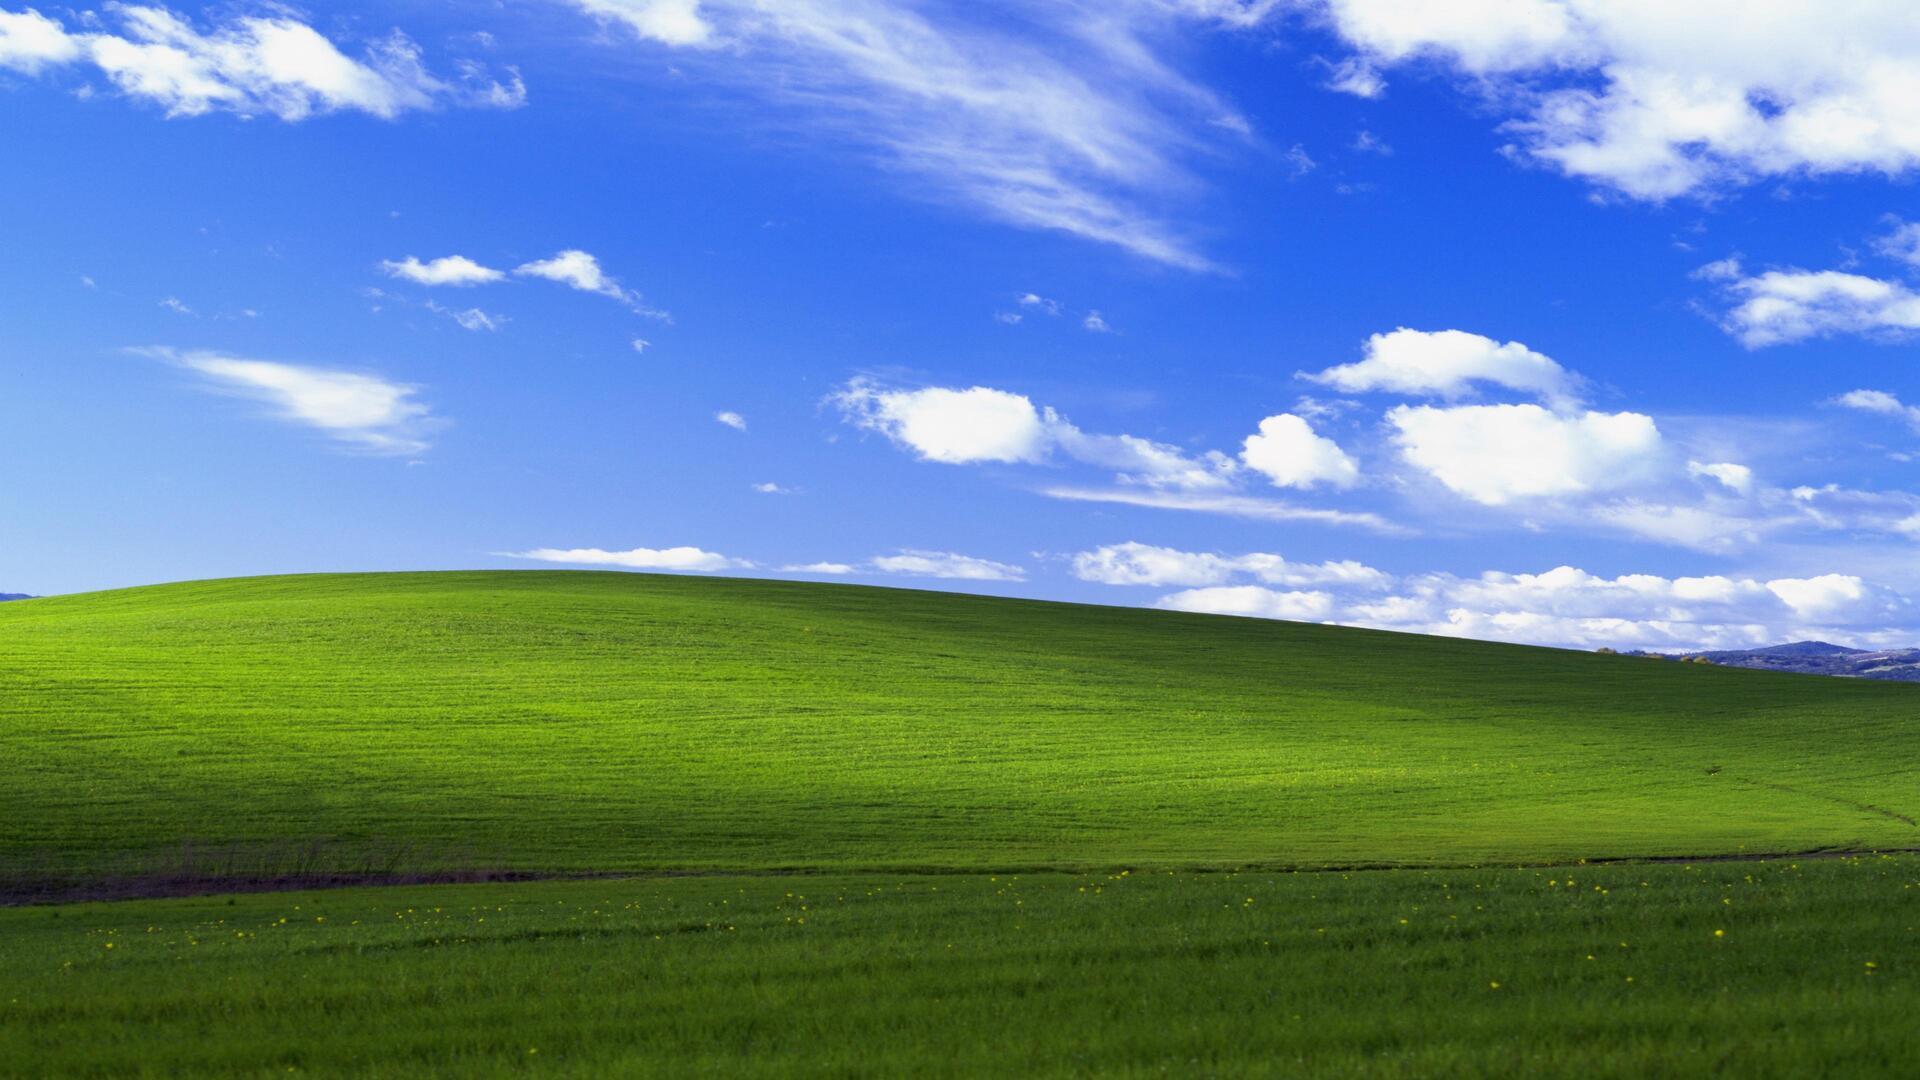 1920x1080 windows xp bliss